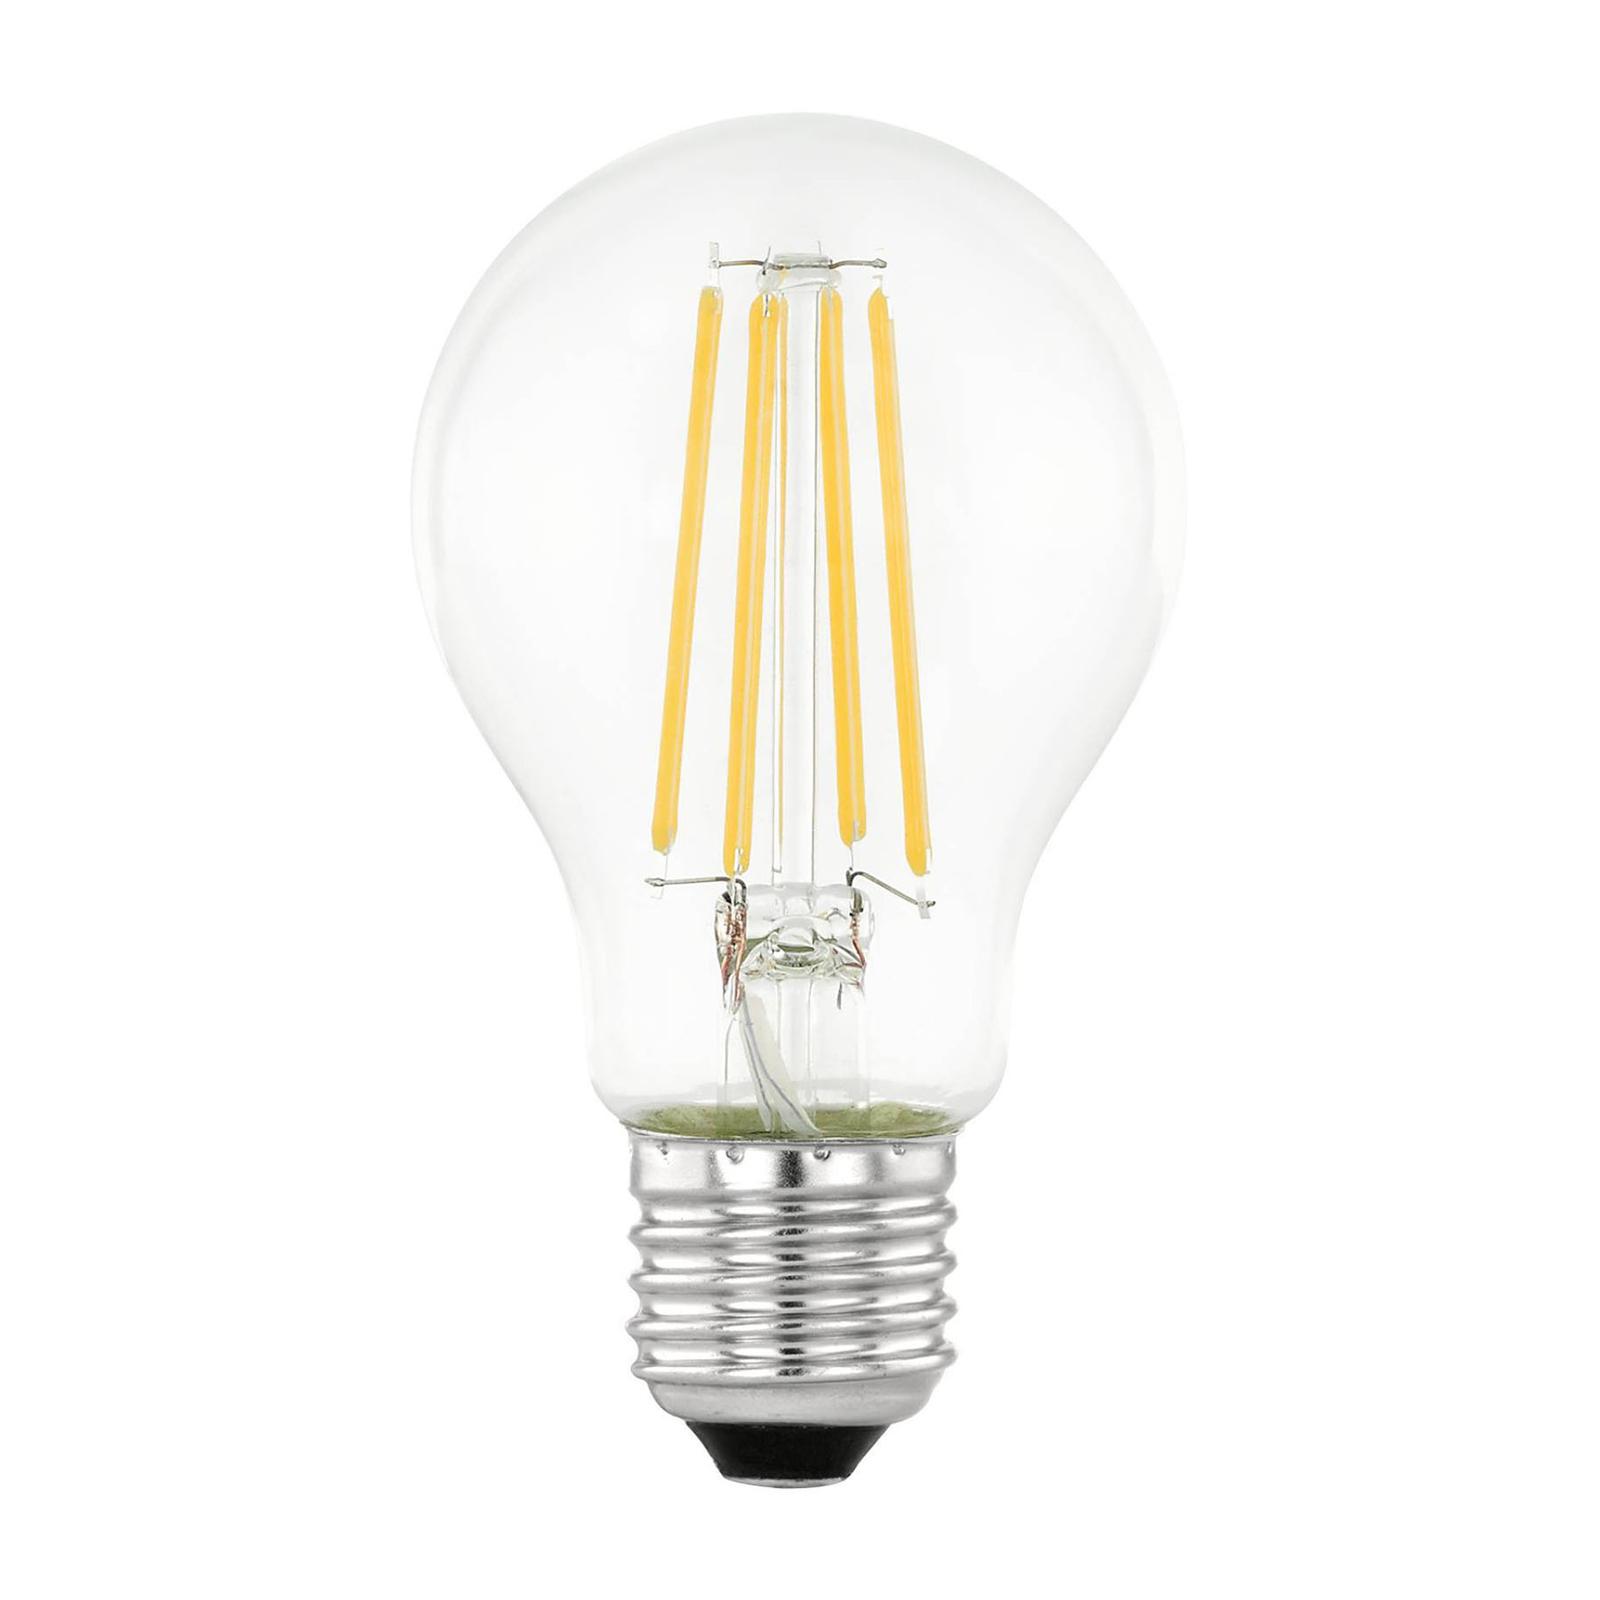 LED-Lampe E27 6W Filament mit Tag/Nacht-Sensor